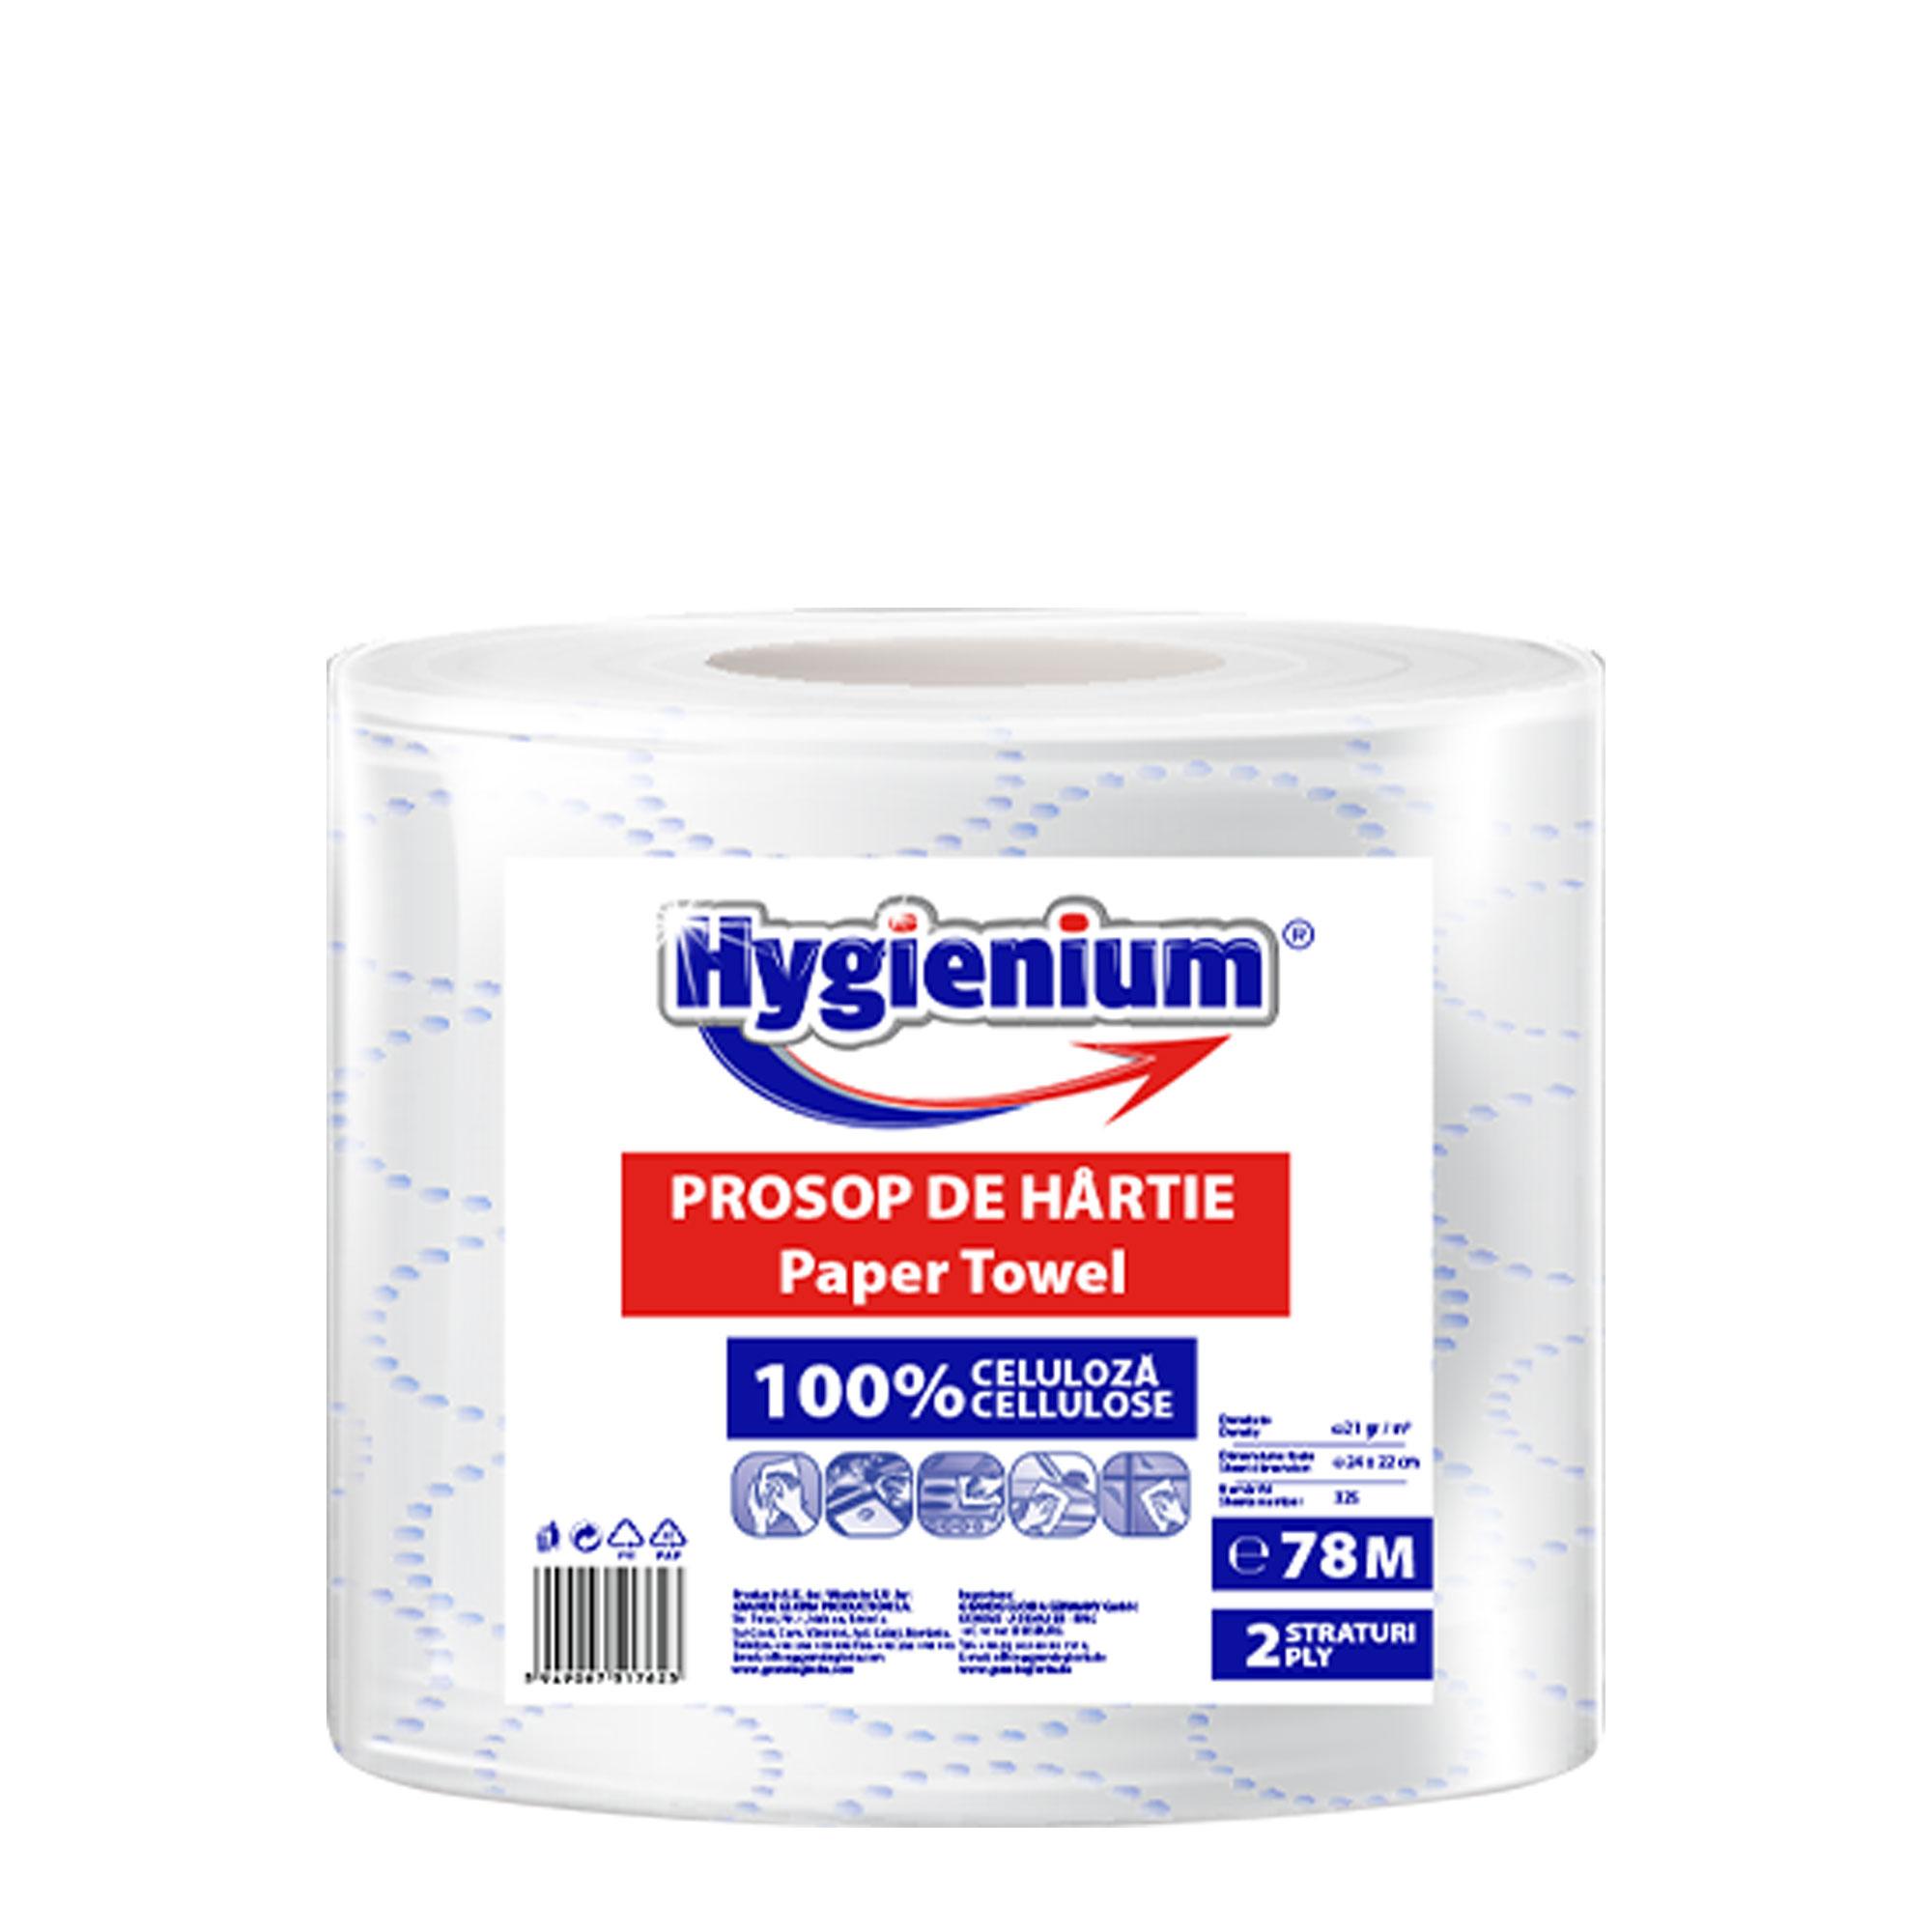 Hygienium Prosop Hartie 78 m